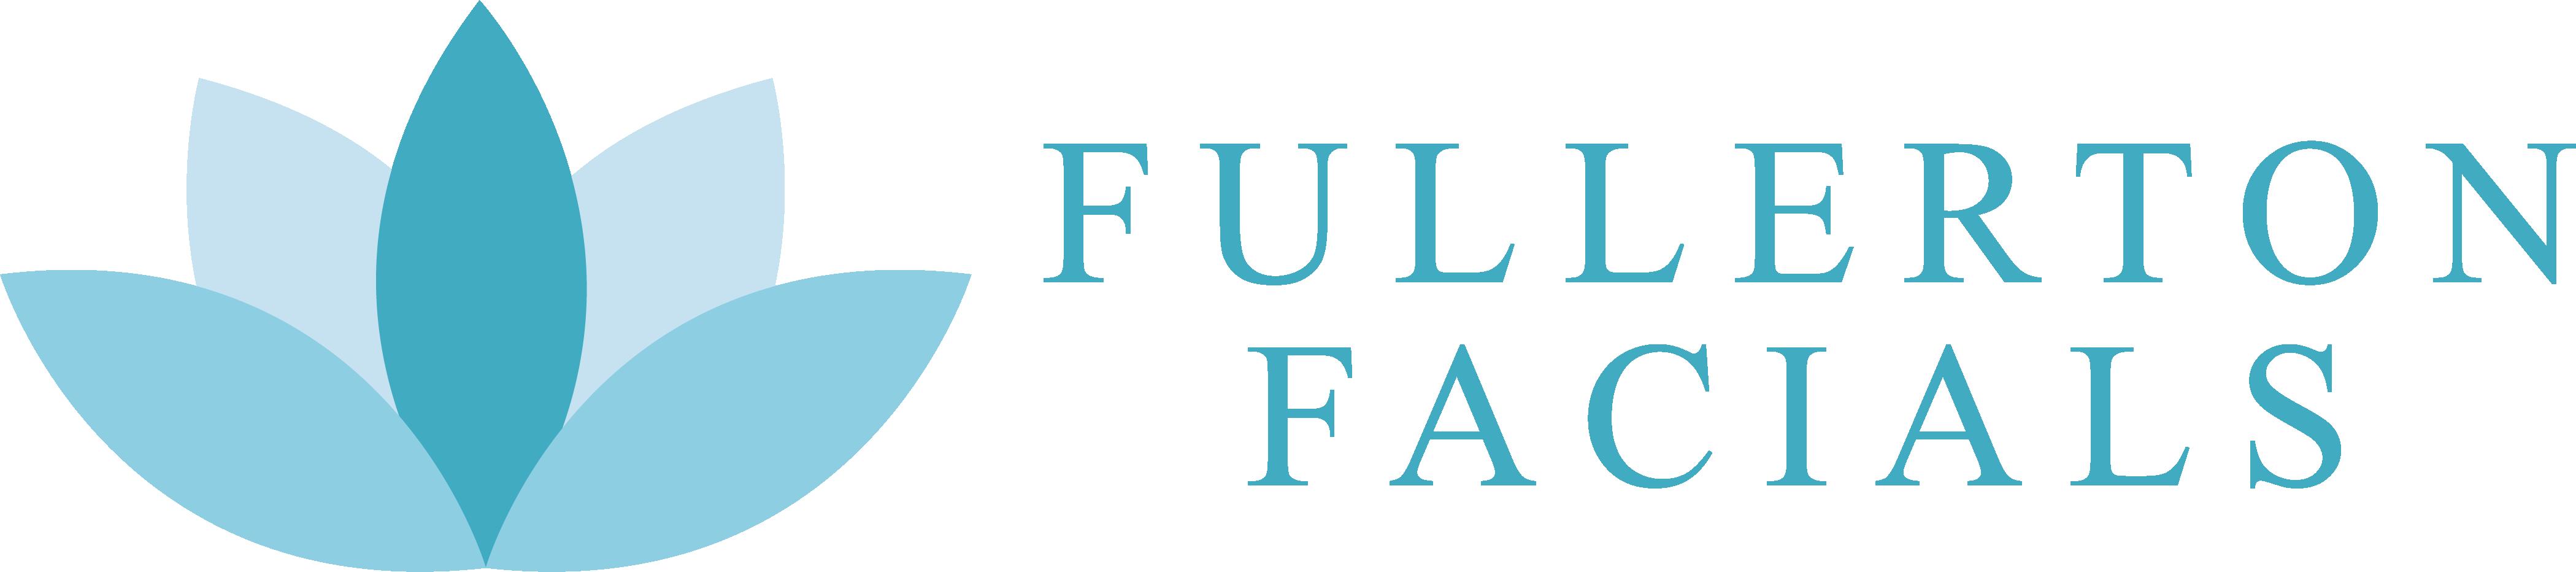 Fullerton Facials